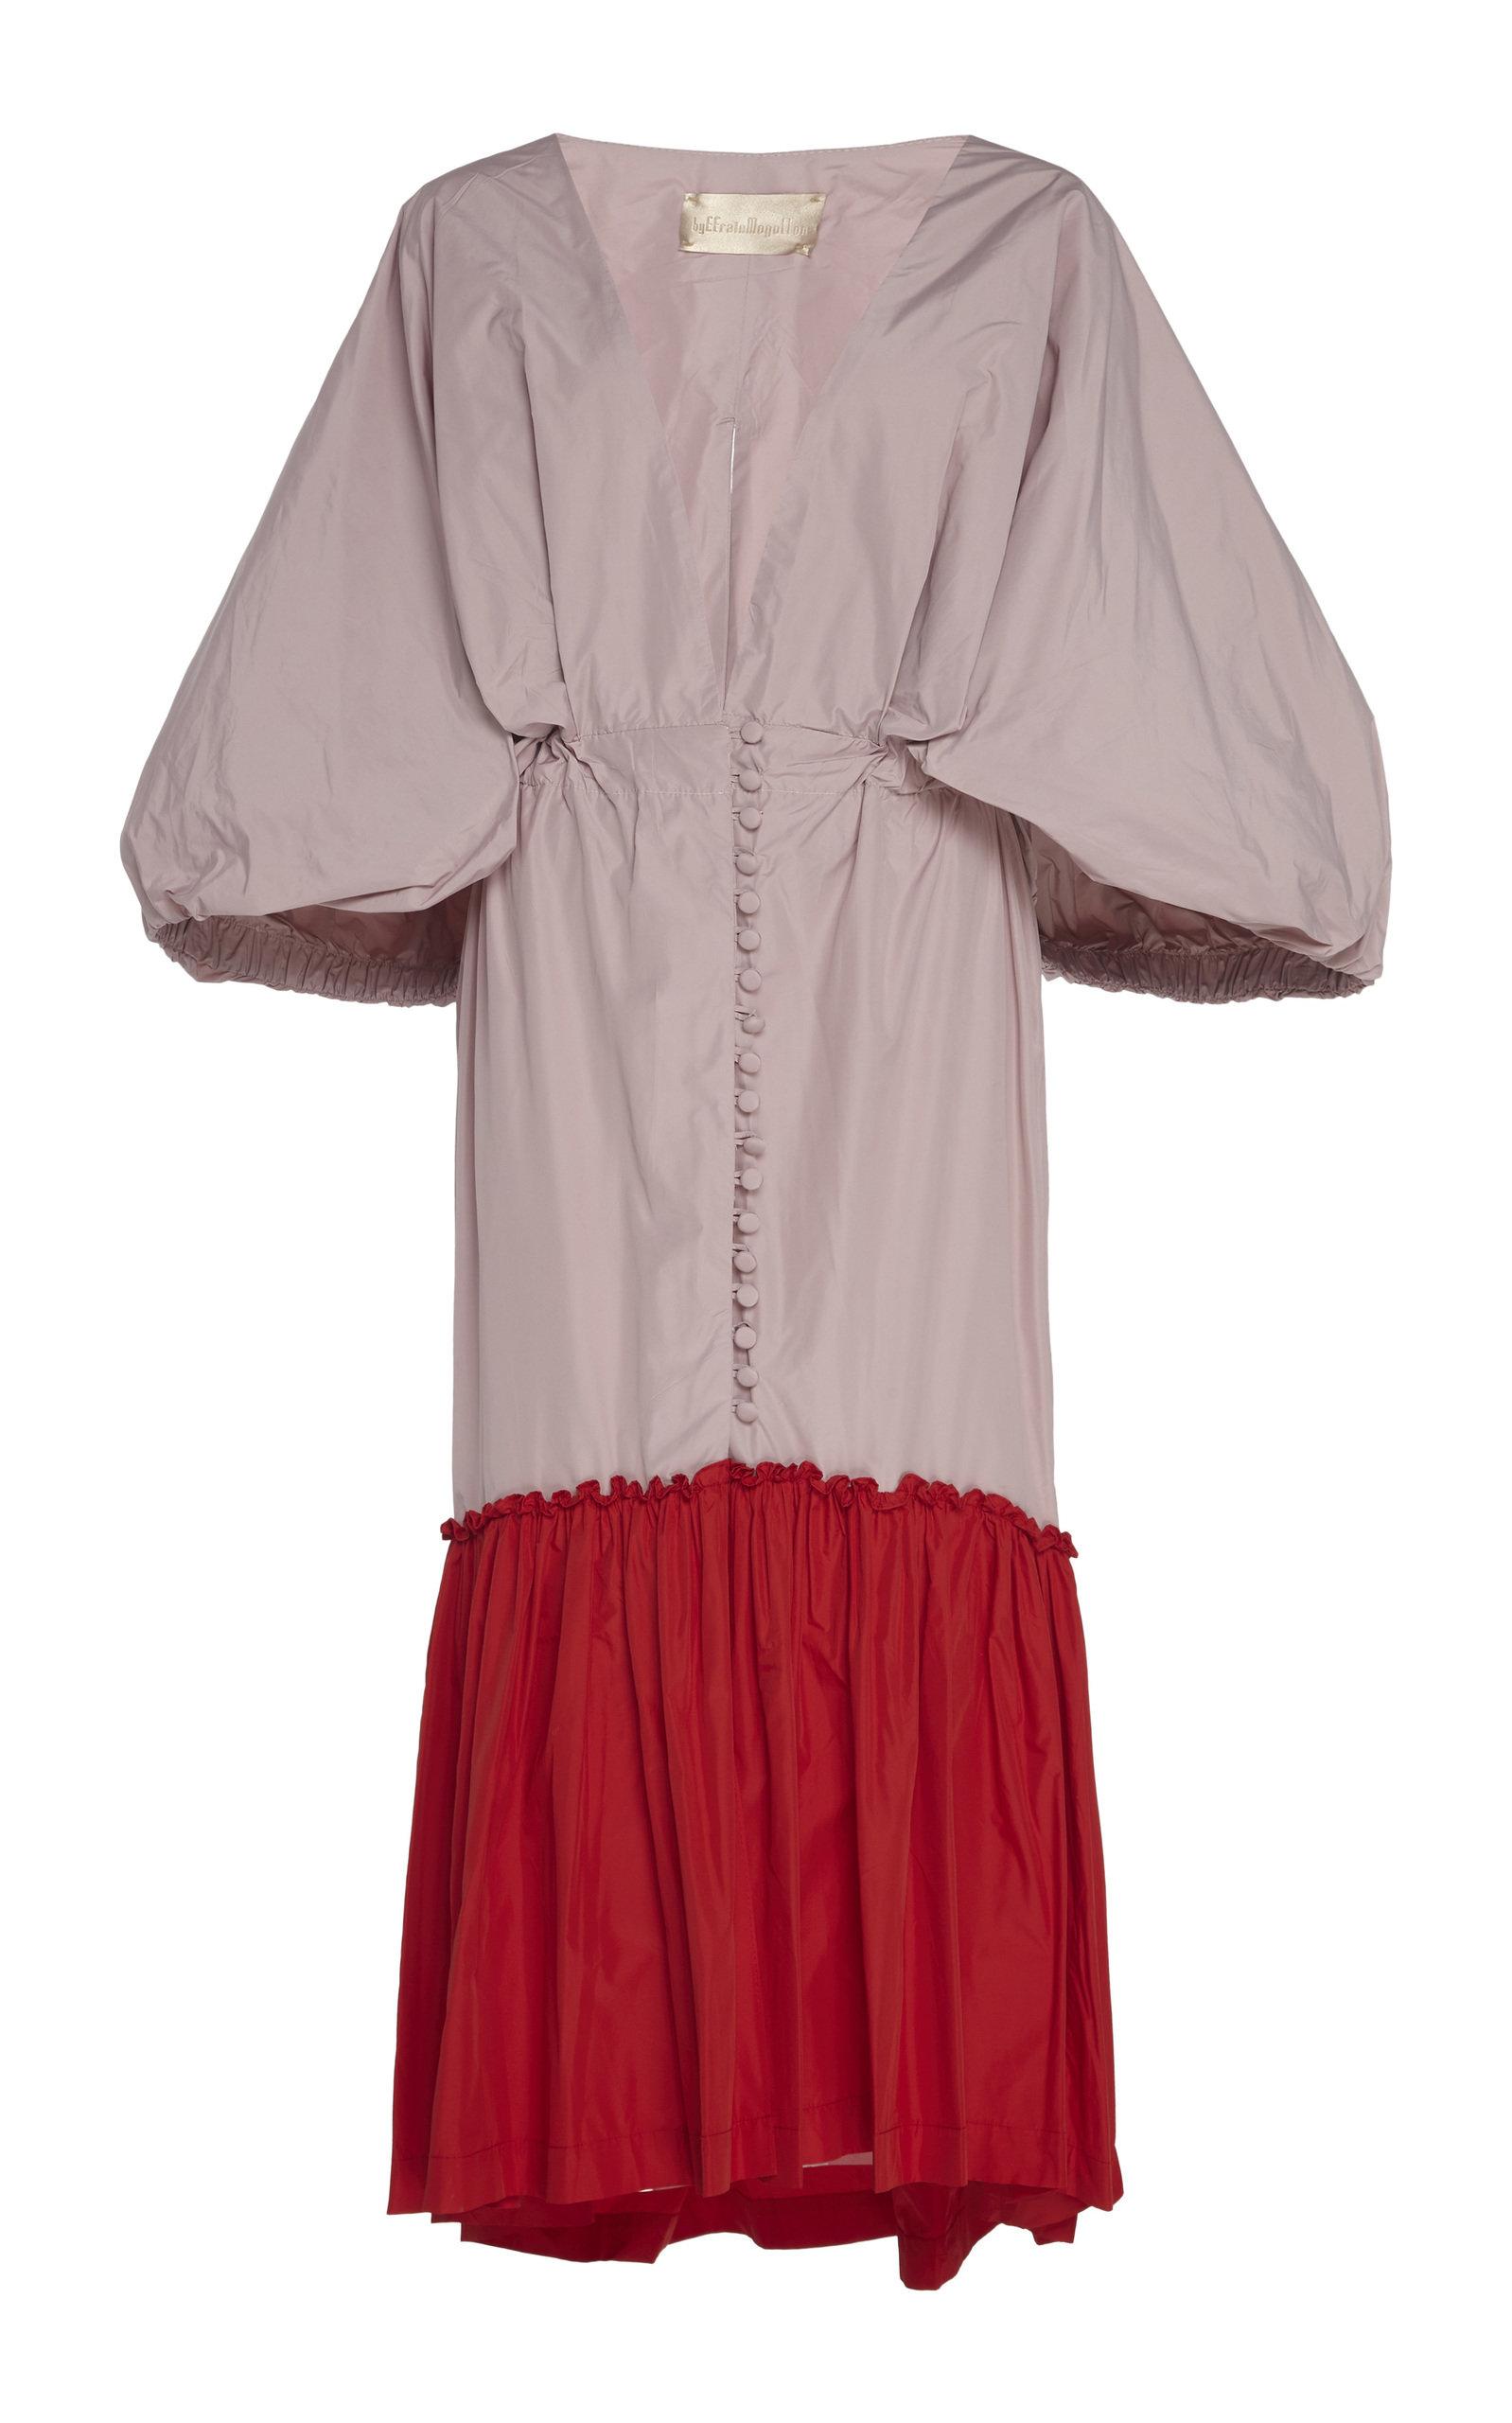 Buy By Efrain Mogollon Pietri Silk-Taffeta Dress online, shop By Efrain Mogollon at the best price